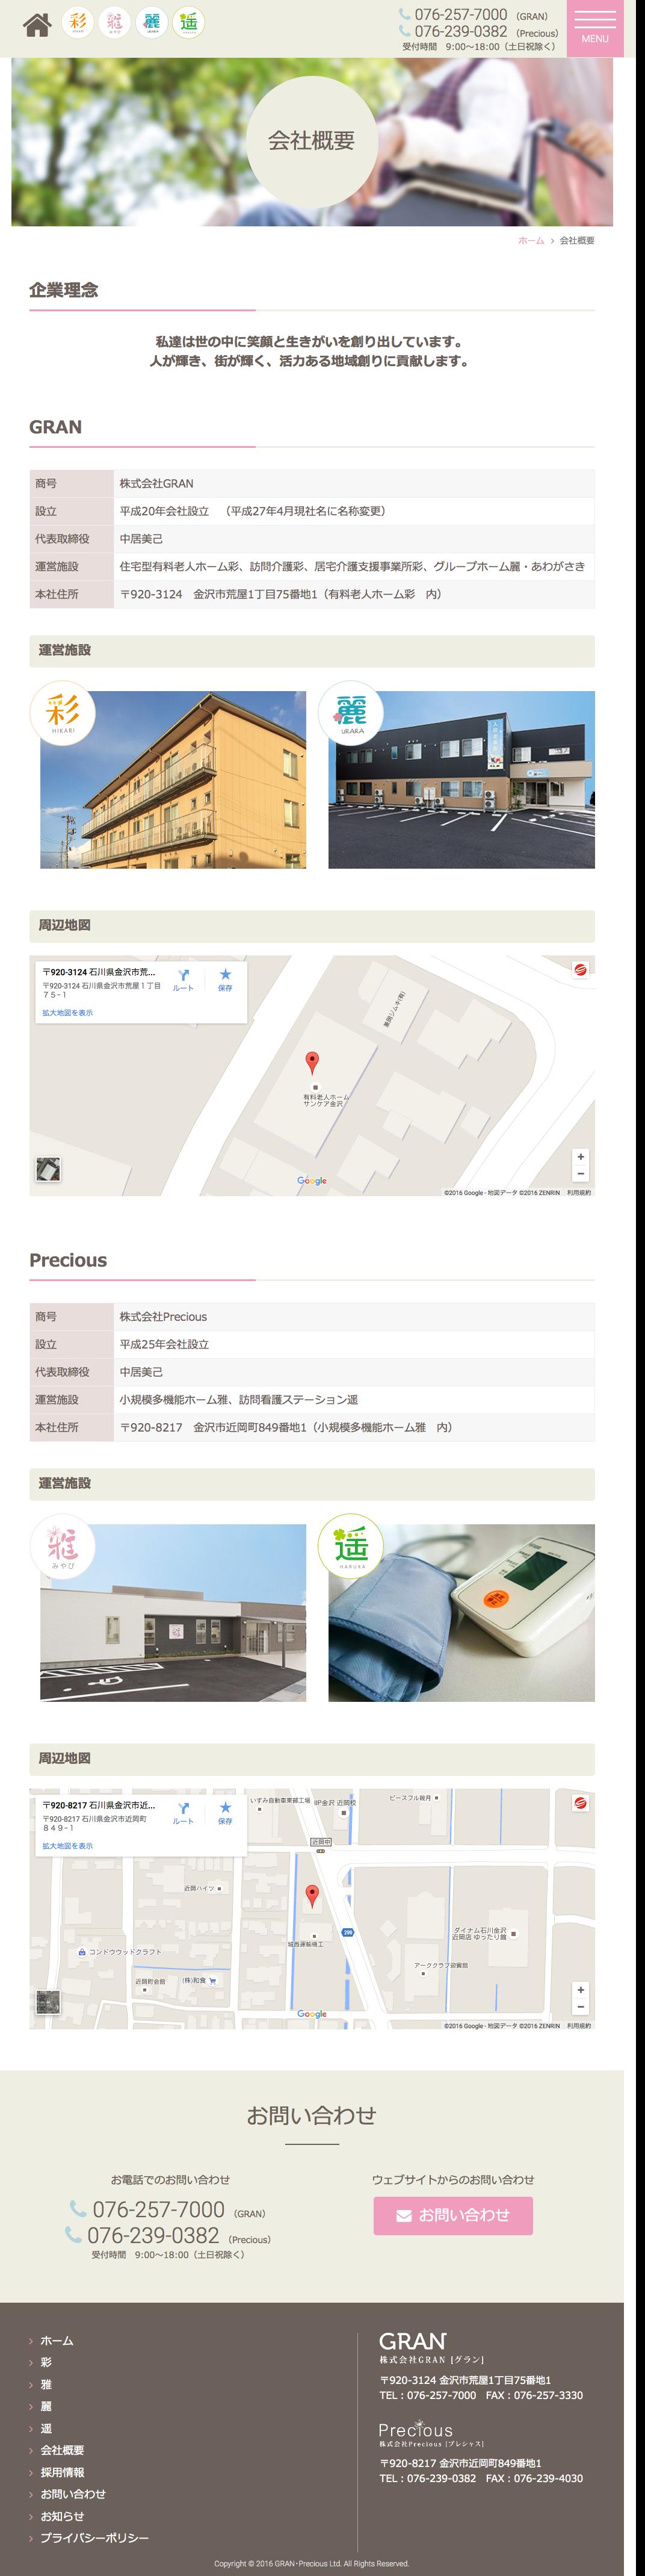 株式会社GRAN・Precious